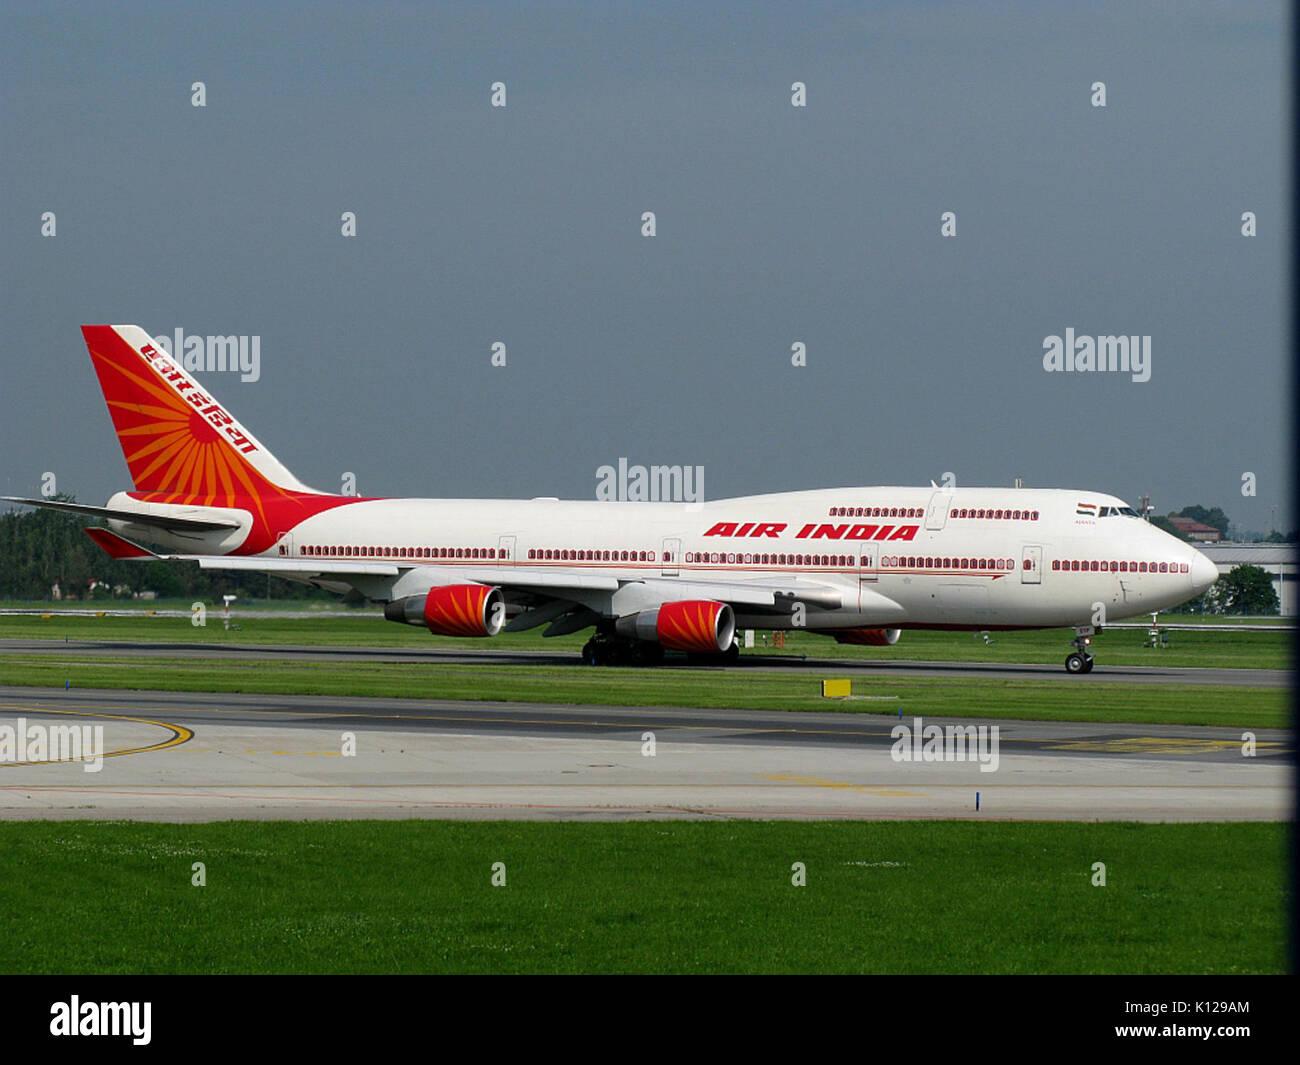 air india booking - HD1024×768